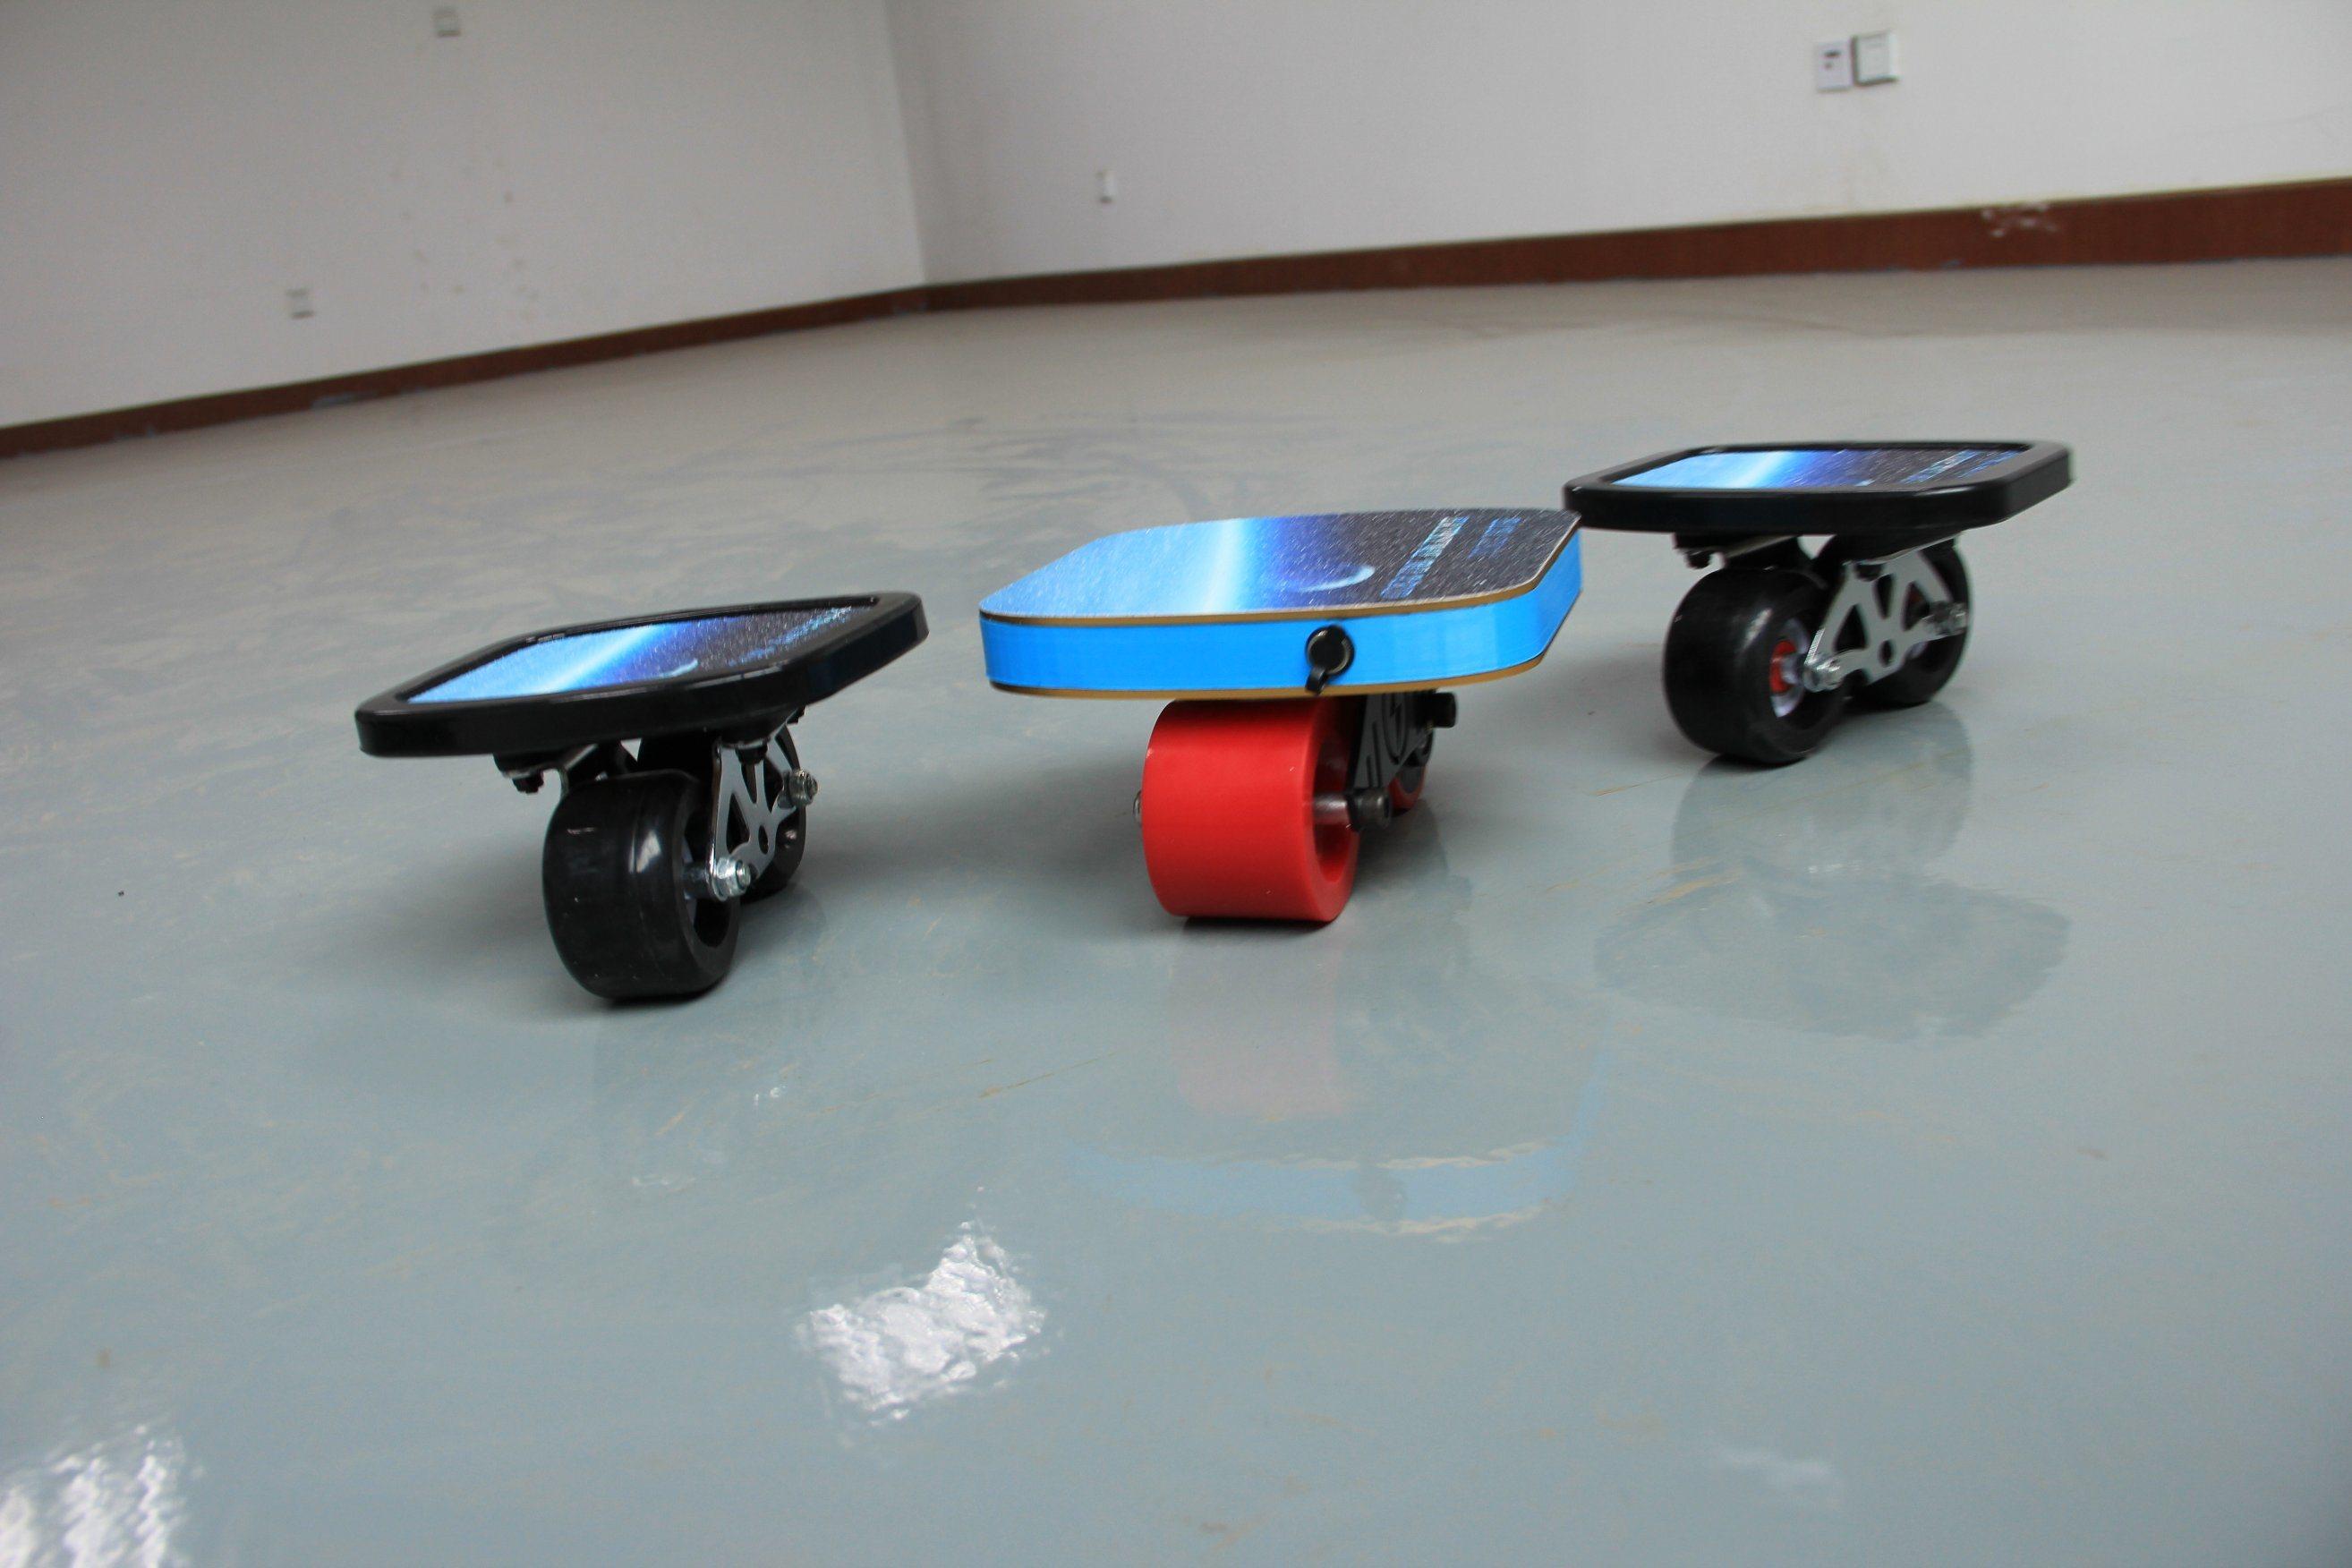 2017 New Design Drifting Board Freeline Skates with Remote